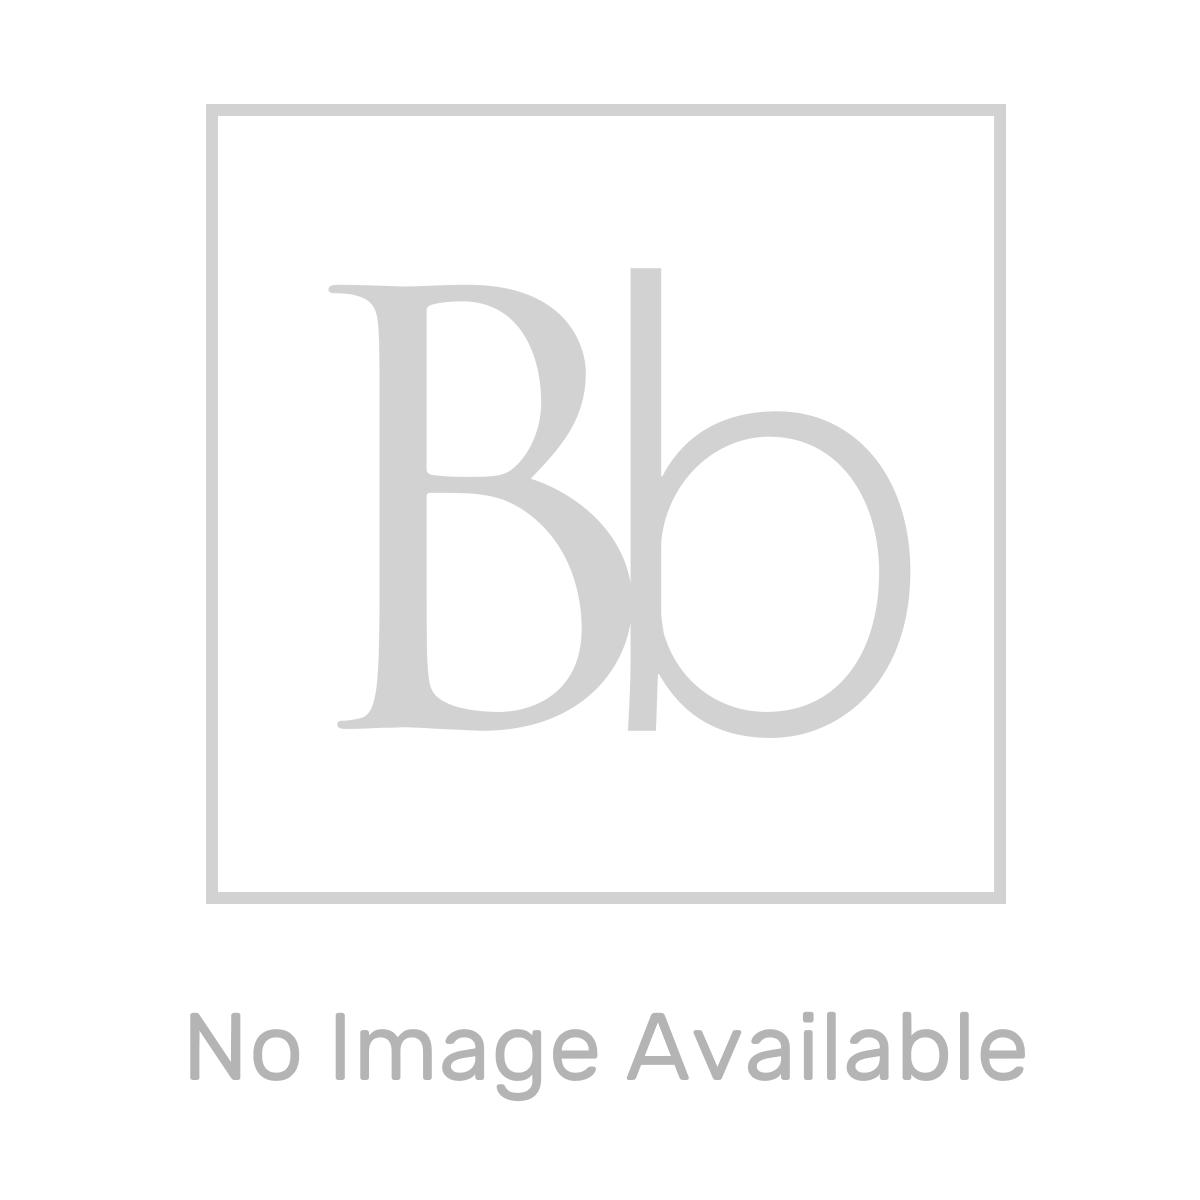 Hudson Reed Quartet Grey Gloss Vanity Unit 720mm